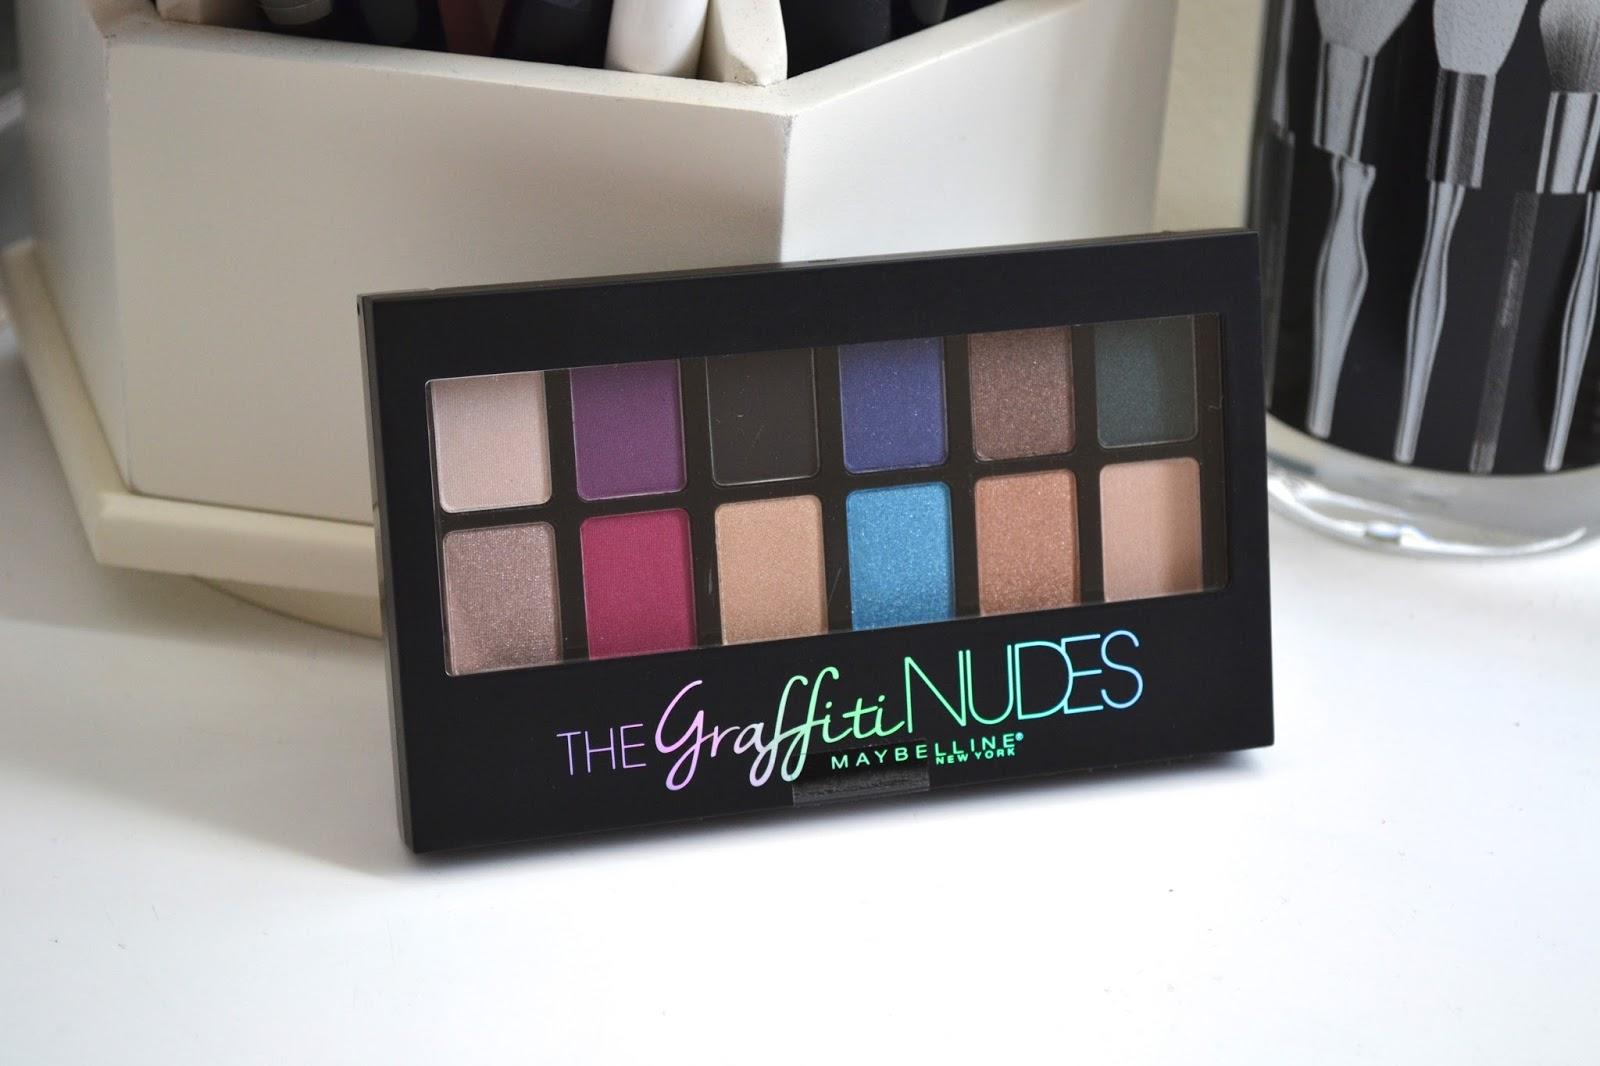 Maybelline® New York The Graffiti Nudes Eyeshadow Palette